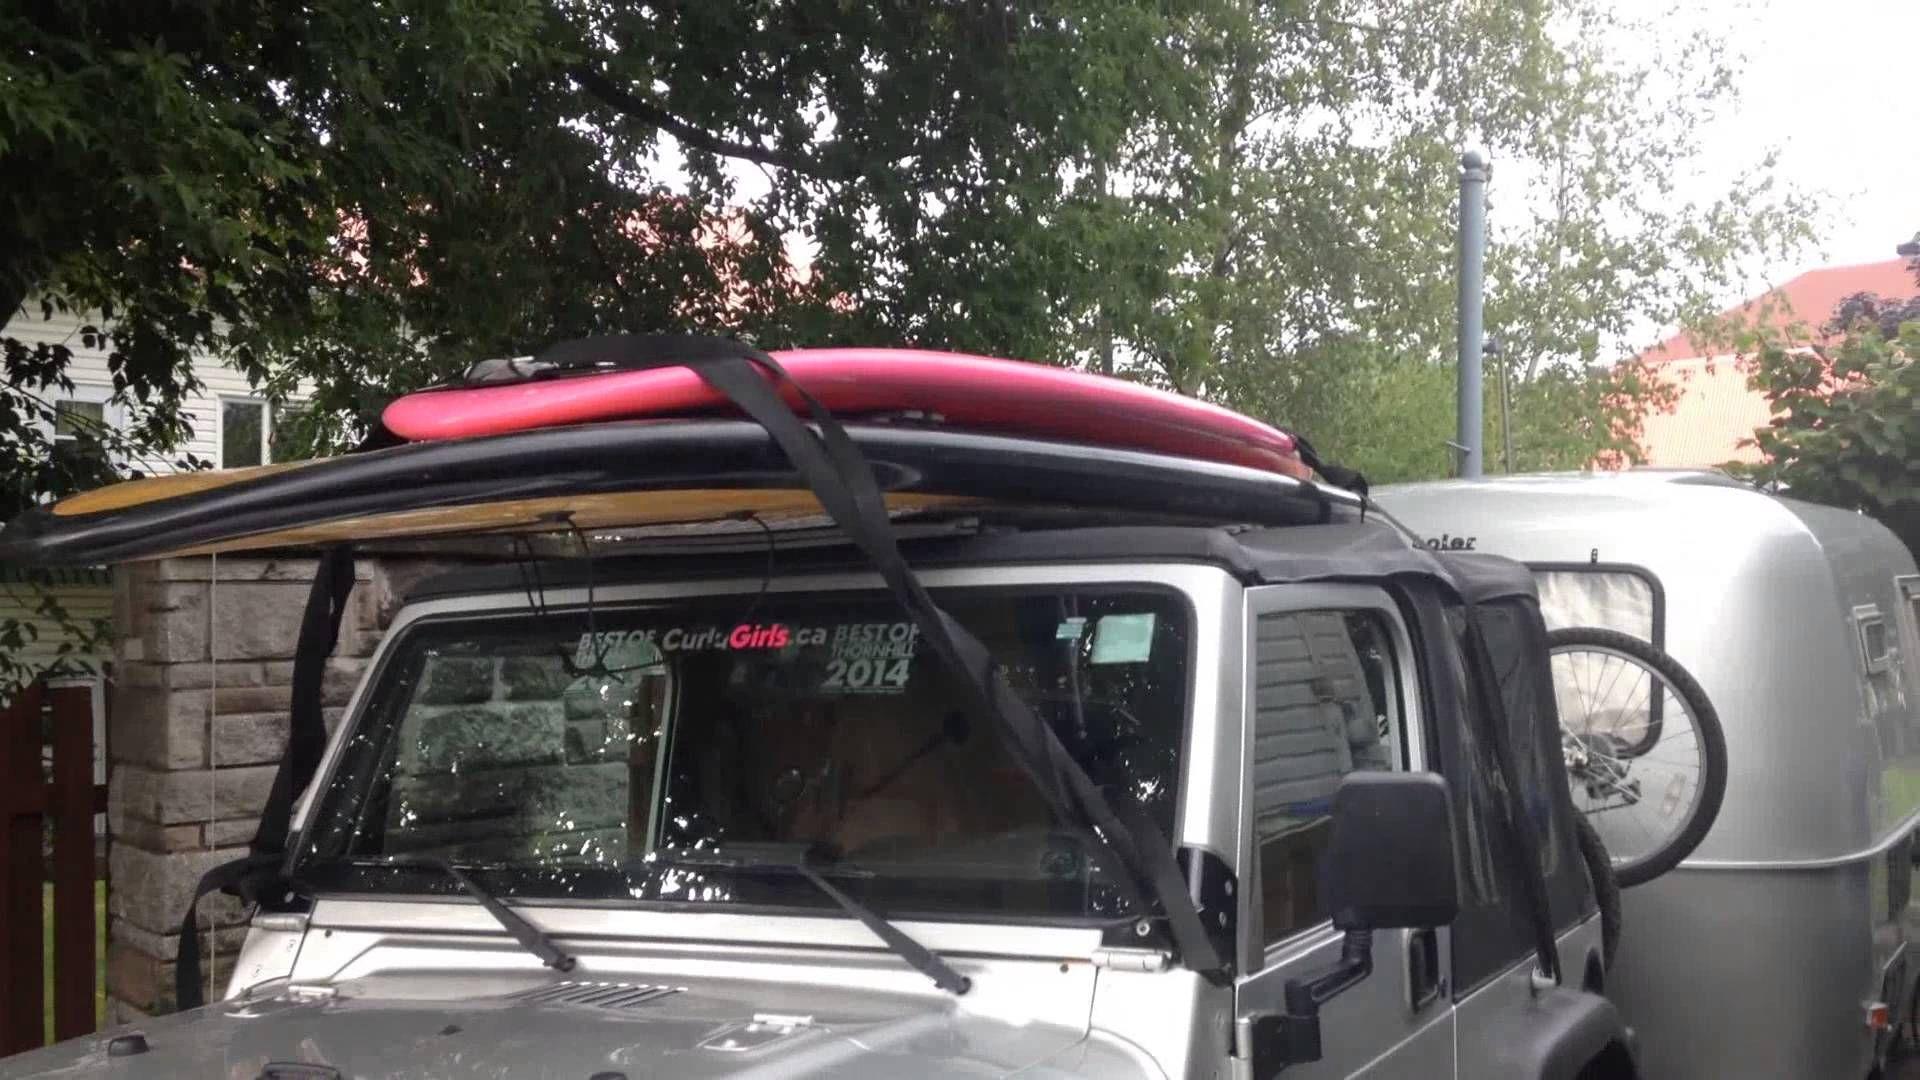 Pin By Machelle Jesko On Jeep Jeep Wrangler Jeep Racks Kayak